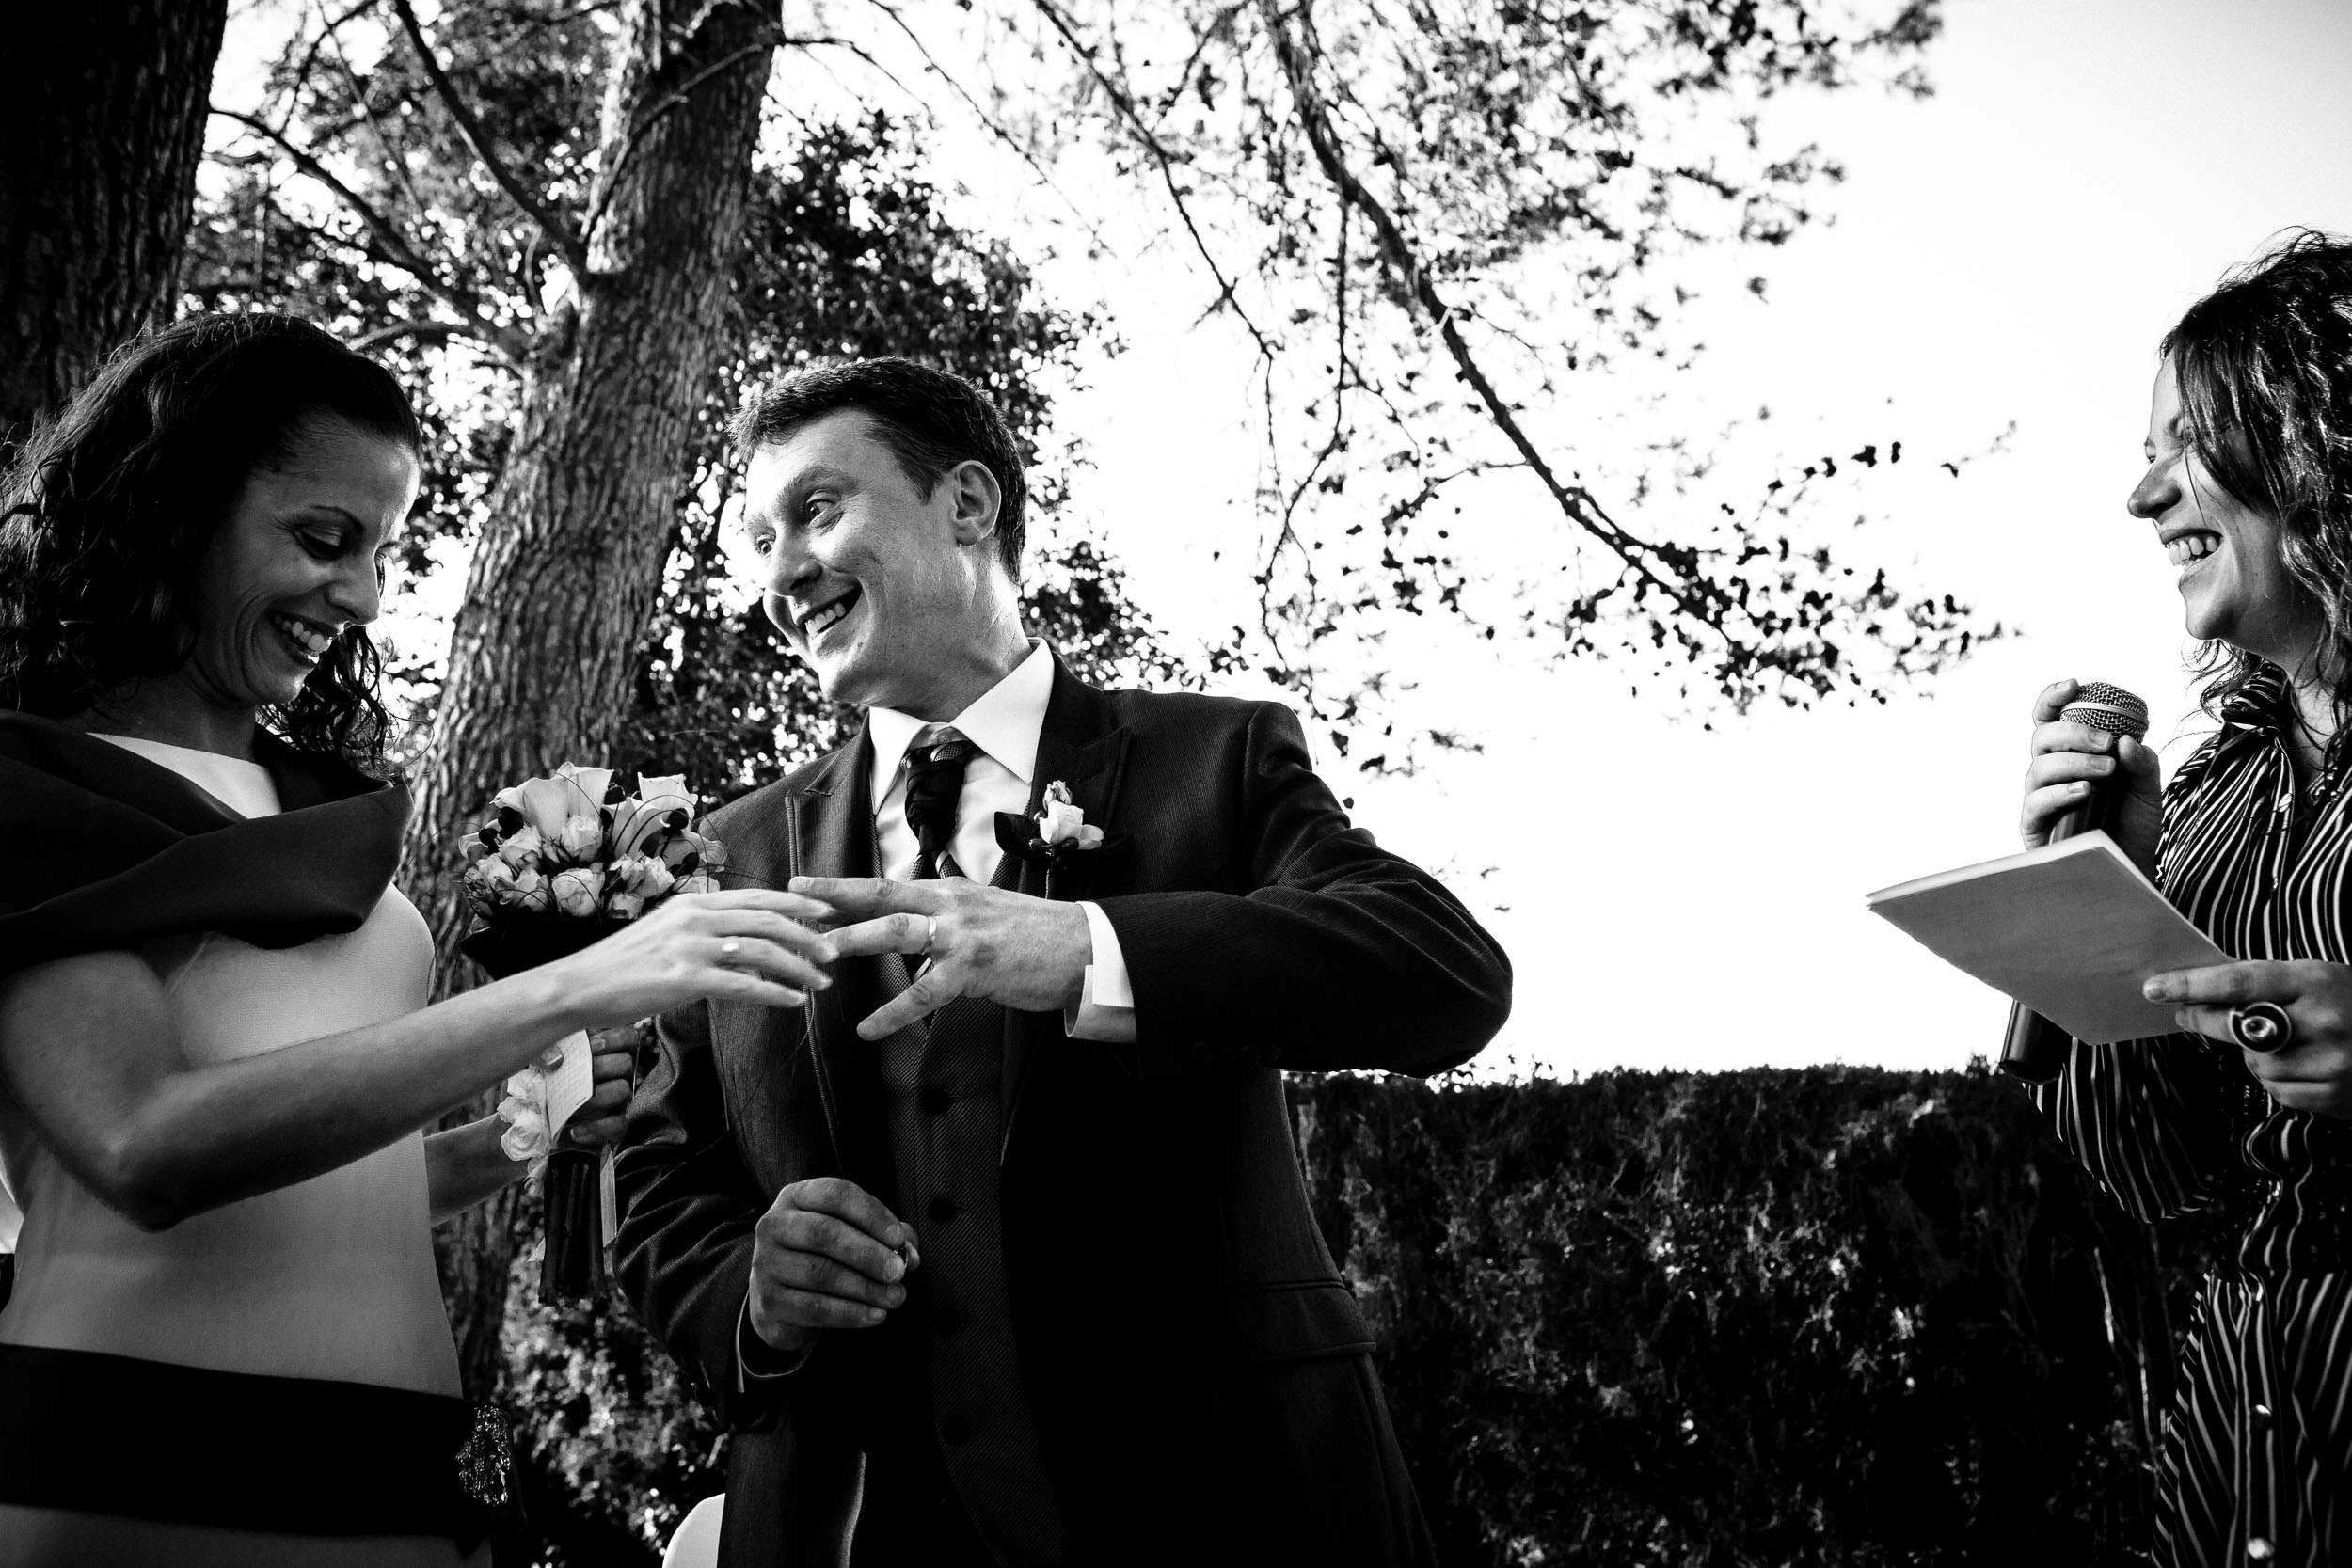 Destination Wedding   Vil.la Sabat Sant Cugat del Valles Barcelona Catalonia Spain - James Sturcke  Photographer   sturcke.org_005.jpg